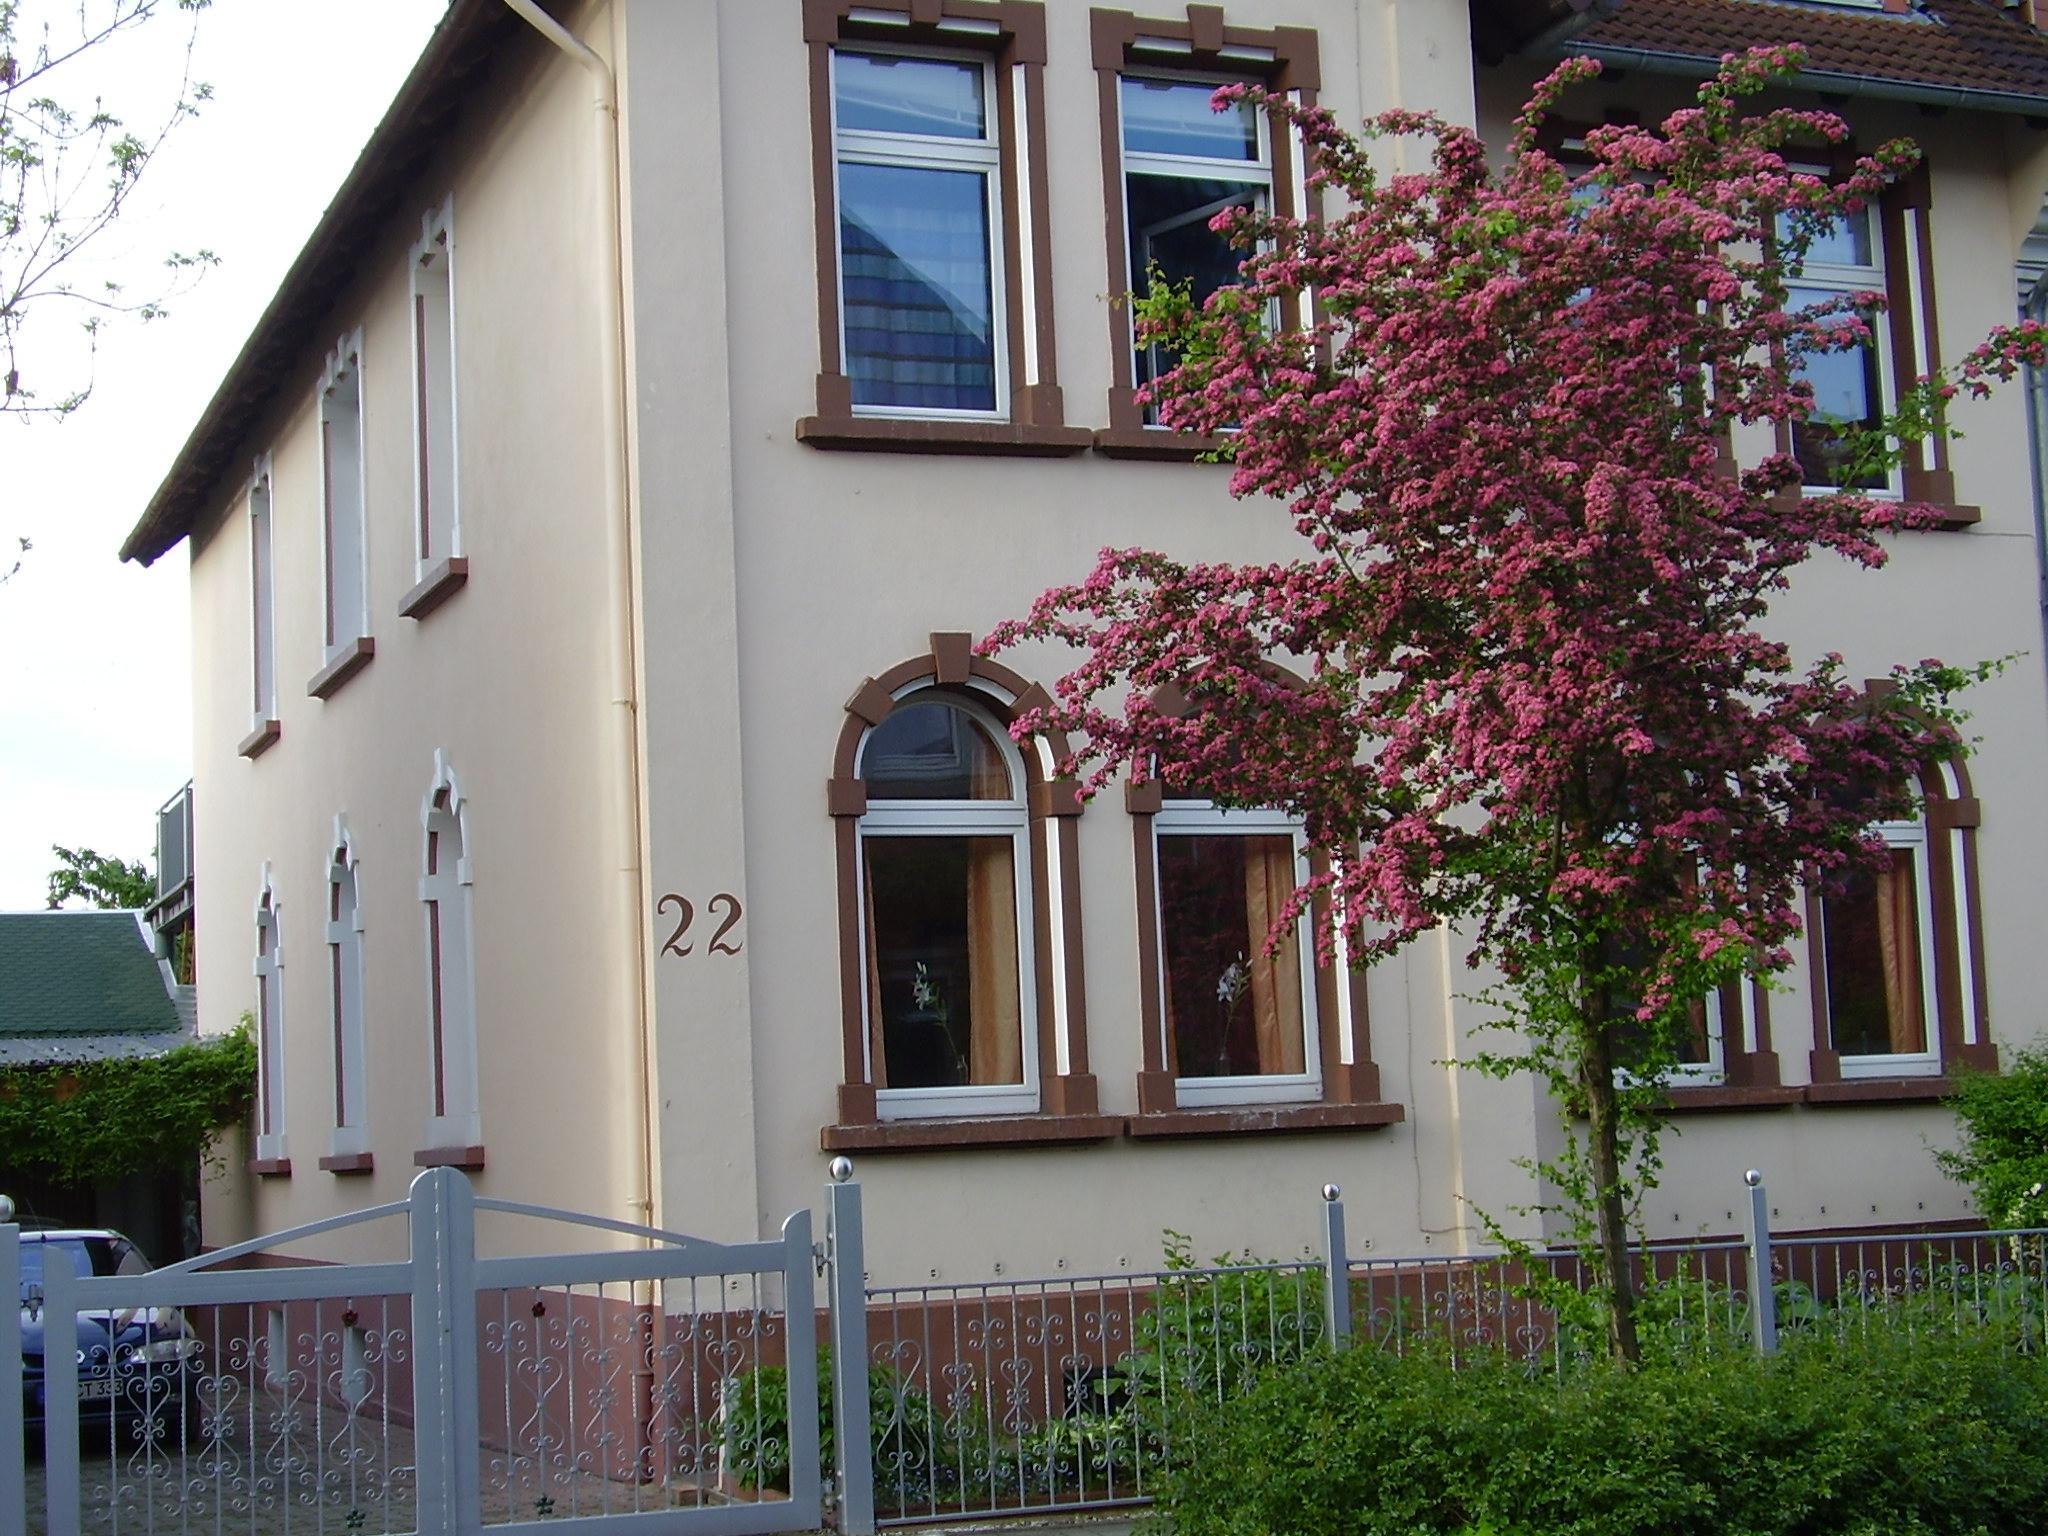 Monteurzimmer 38118 Braunschweig